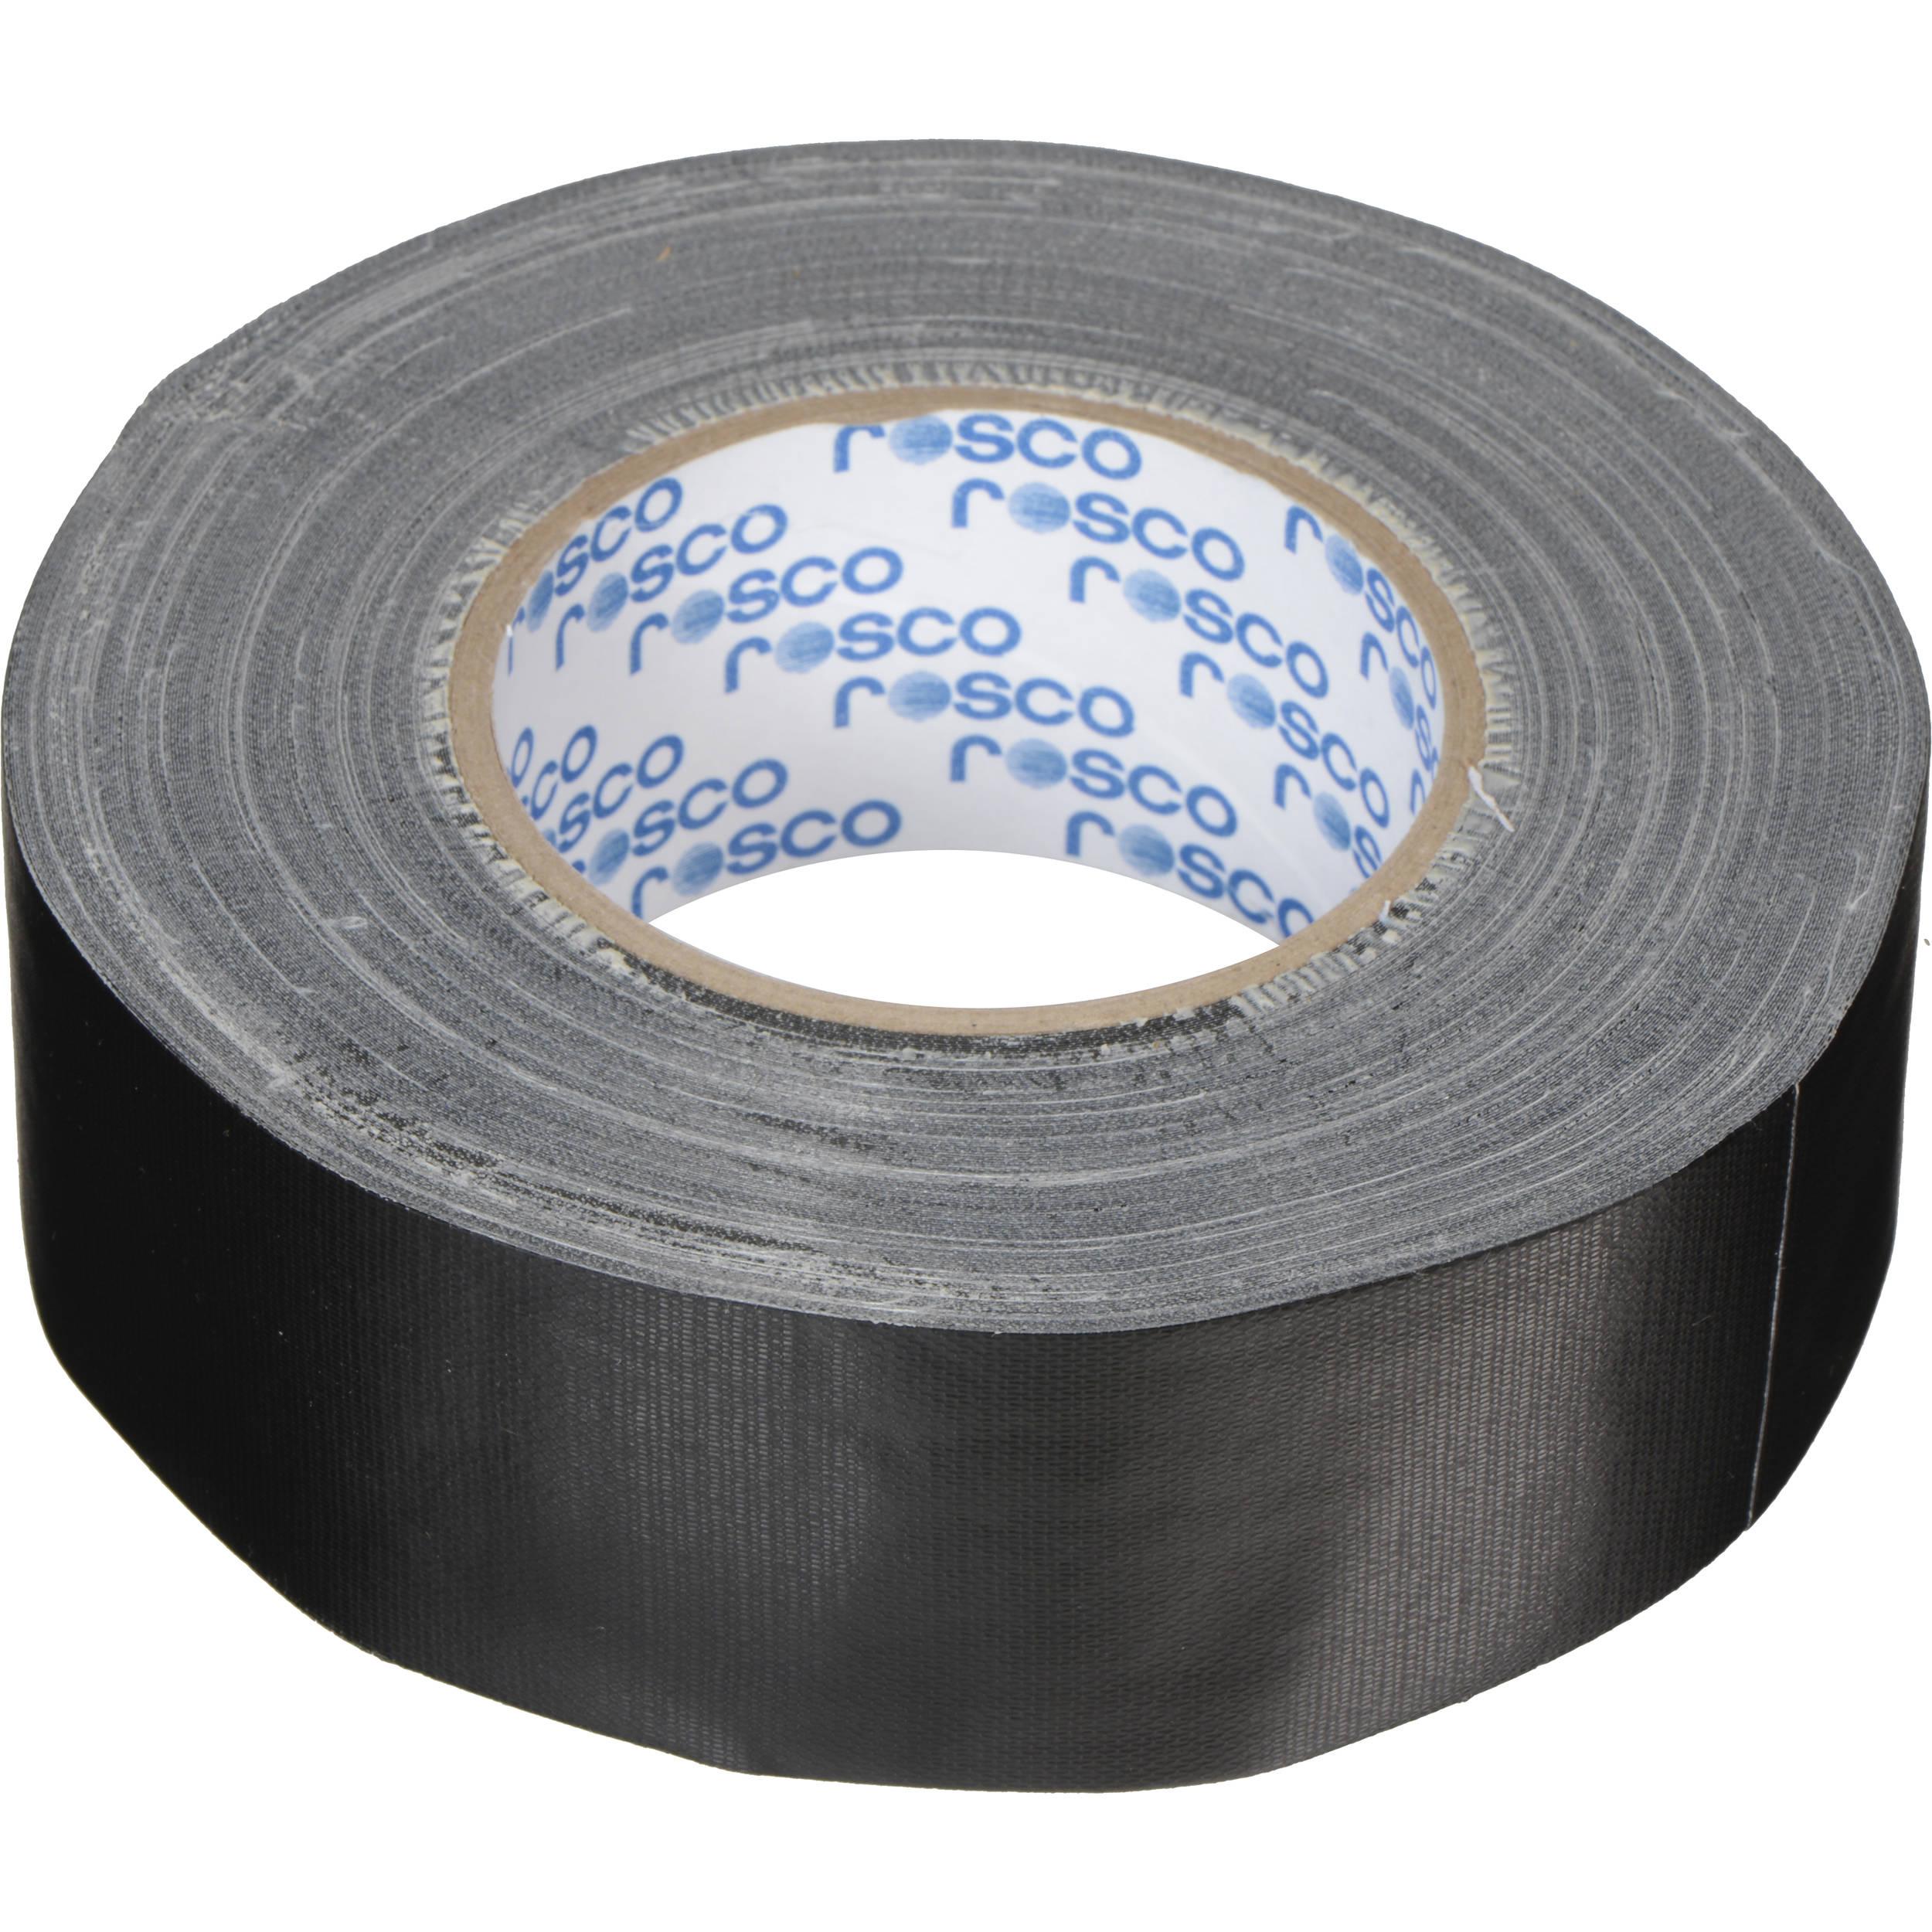 Gaff Tape Black 2 Inch X 30 Yard Roll Main Stage Gaffers Easy Tear No Reflection